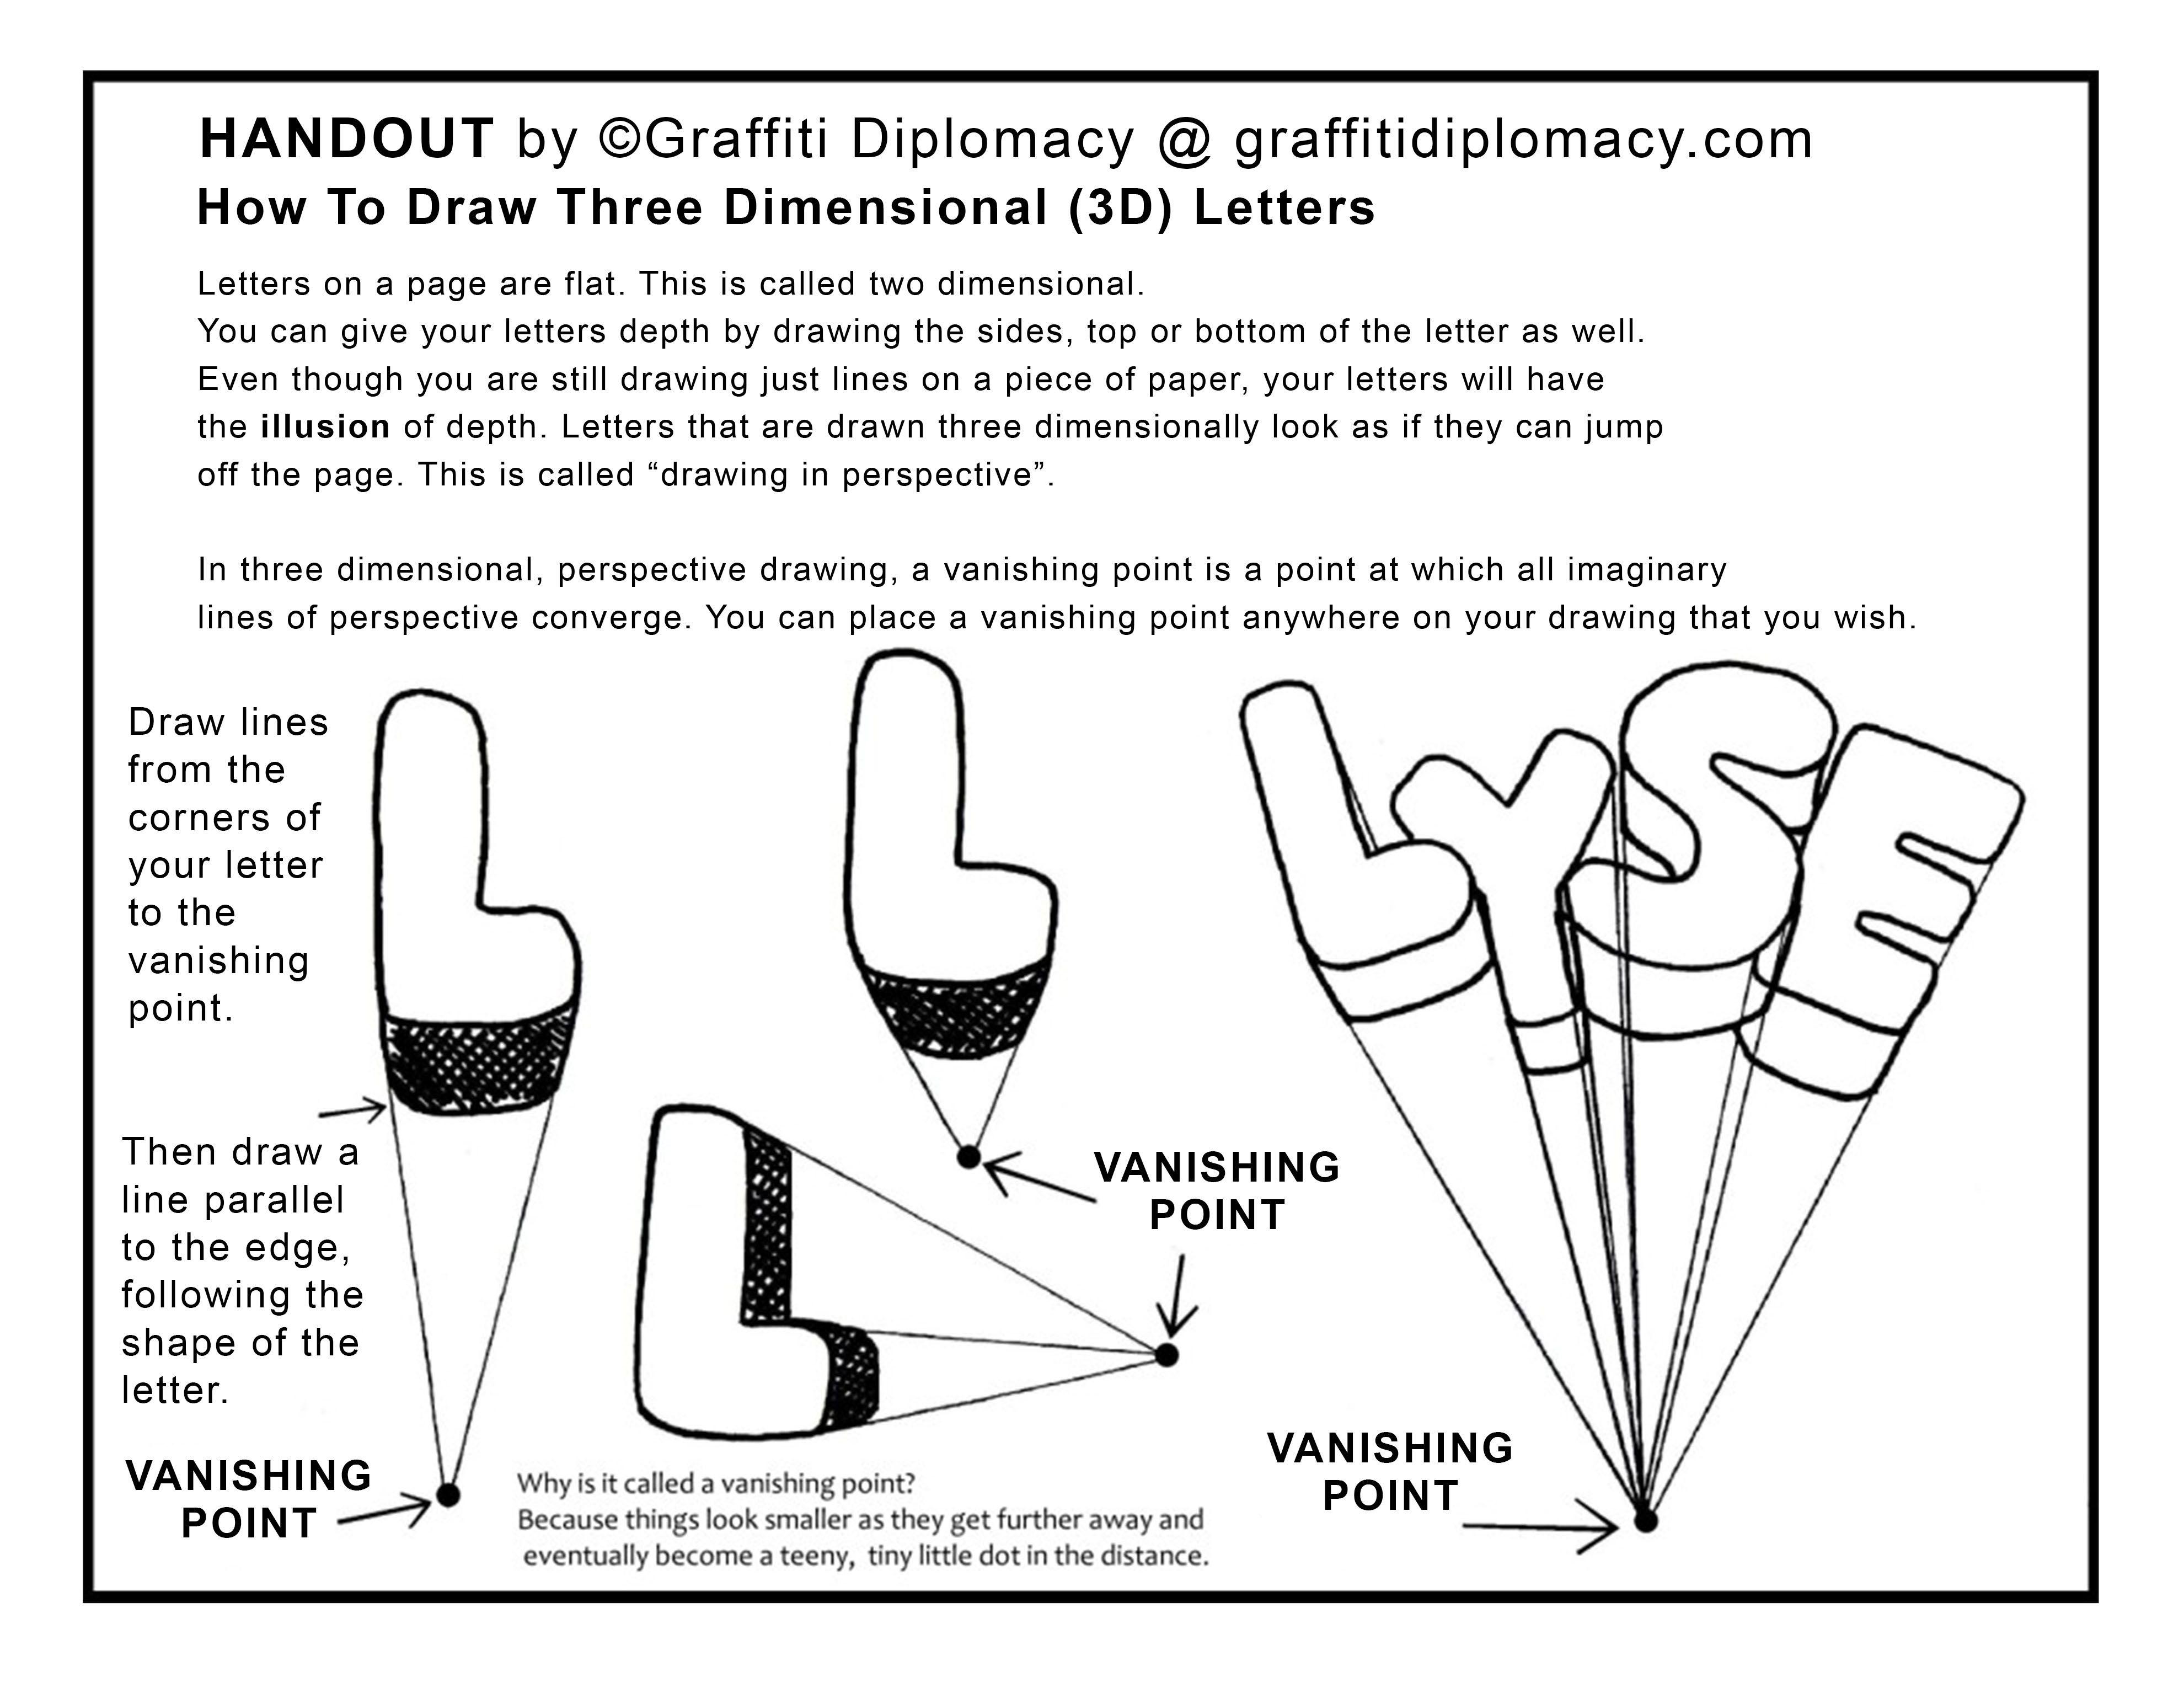 Vanishing Point Lesson By Graffiti Diplomacy 3 960